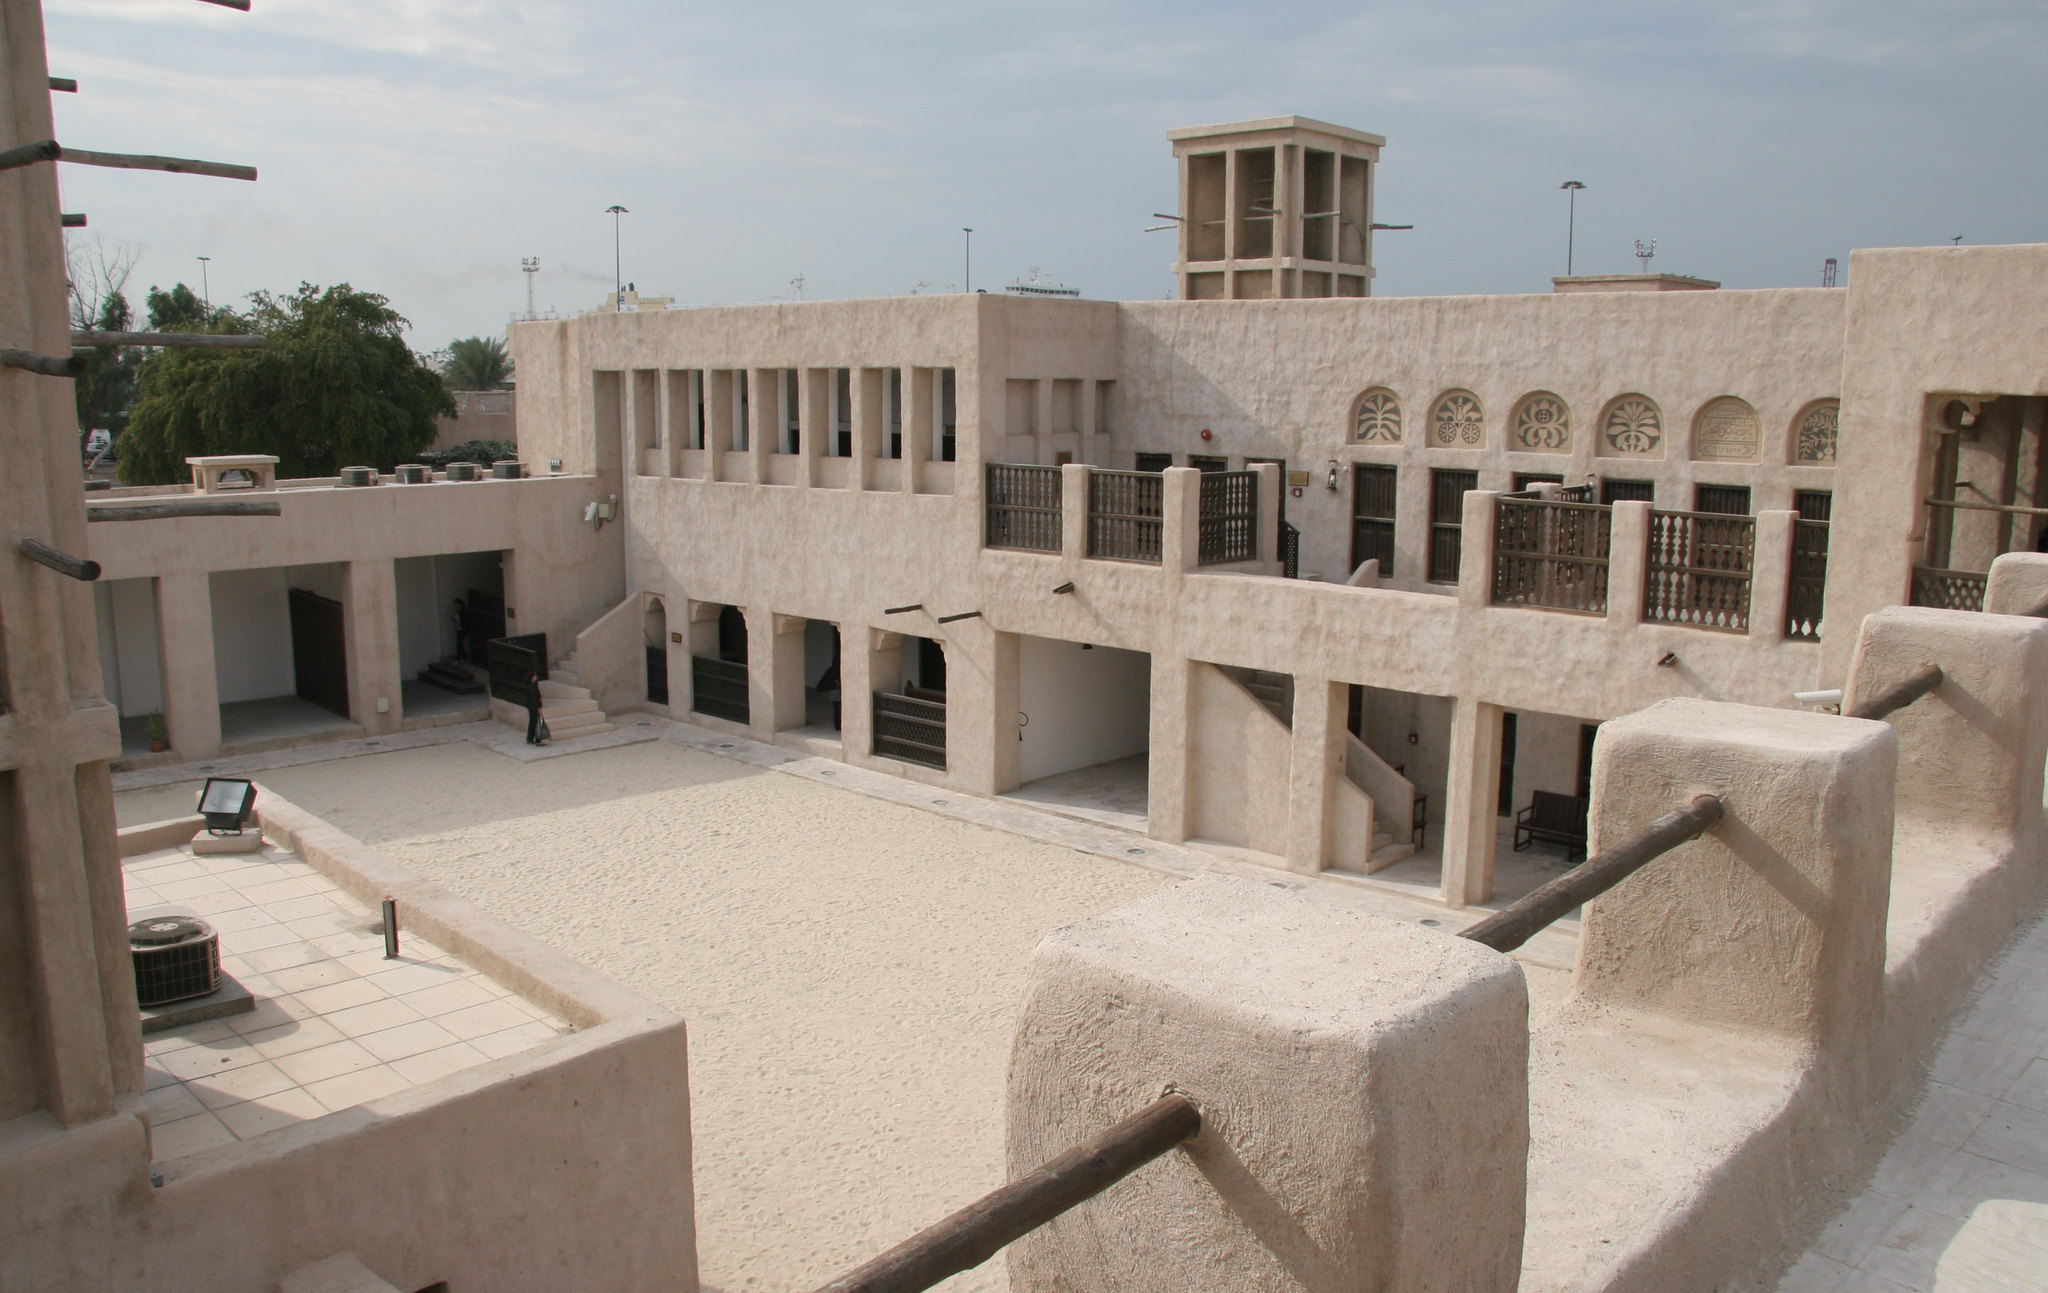 Sheikh Saeed Al Maktoum House, photo by Ian Lloyd.